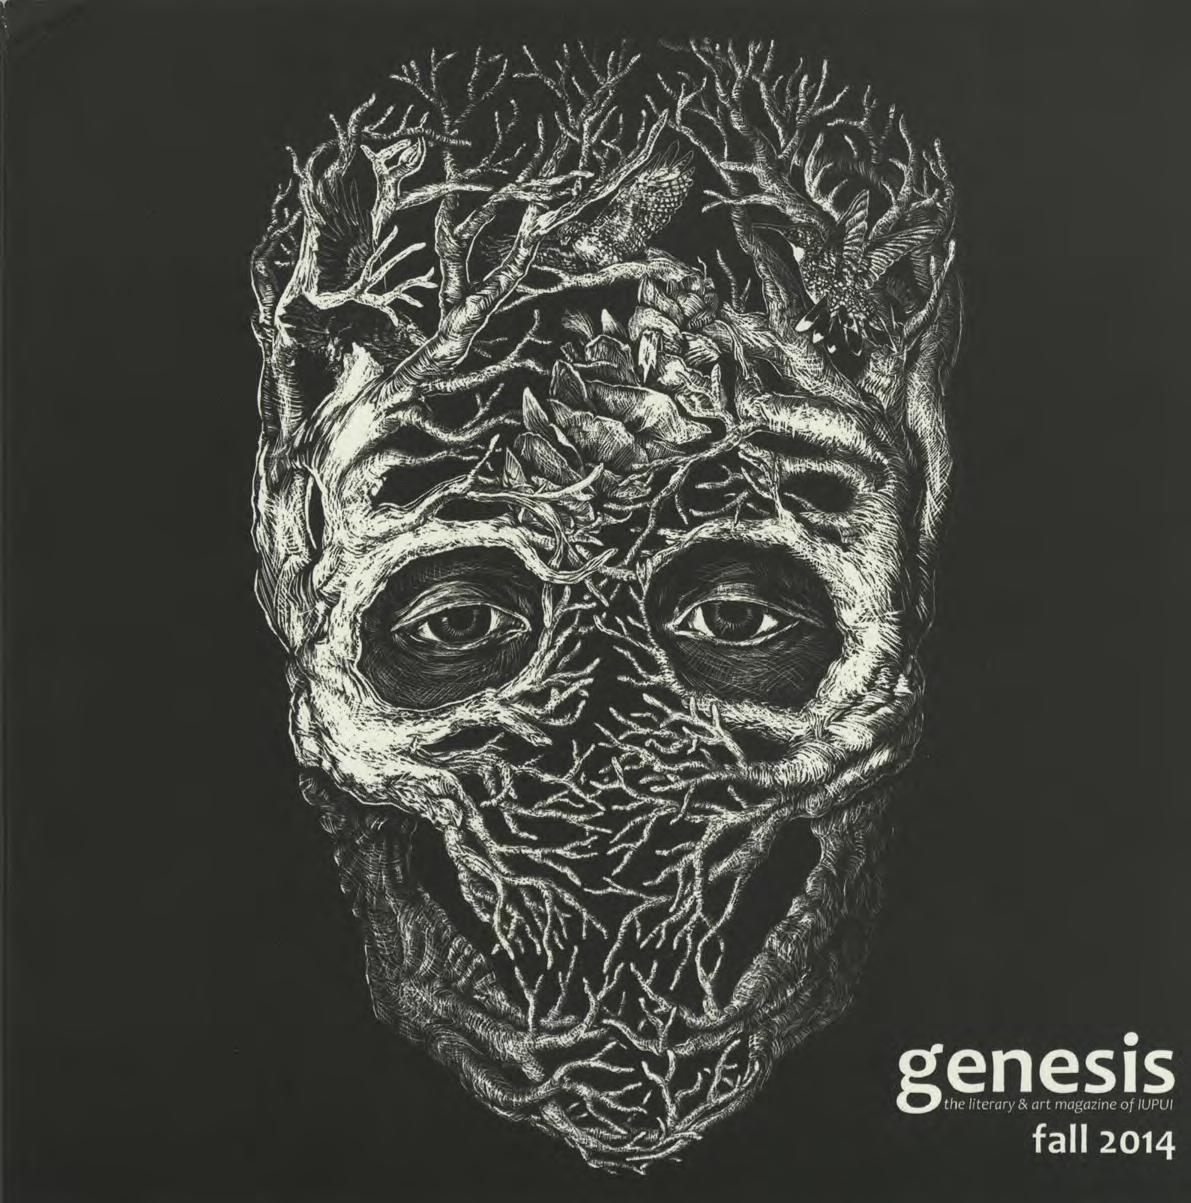 genesis fall 2014 cover